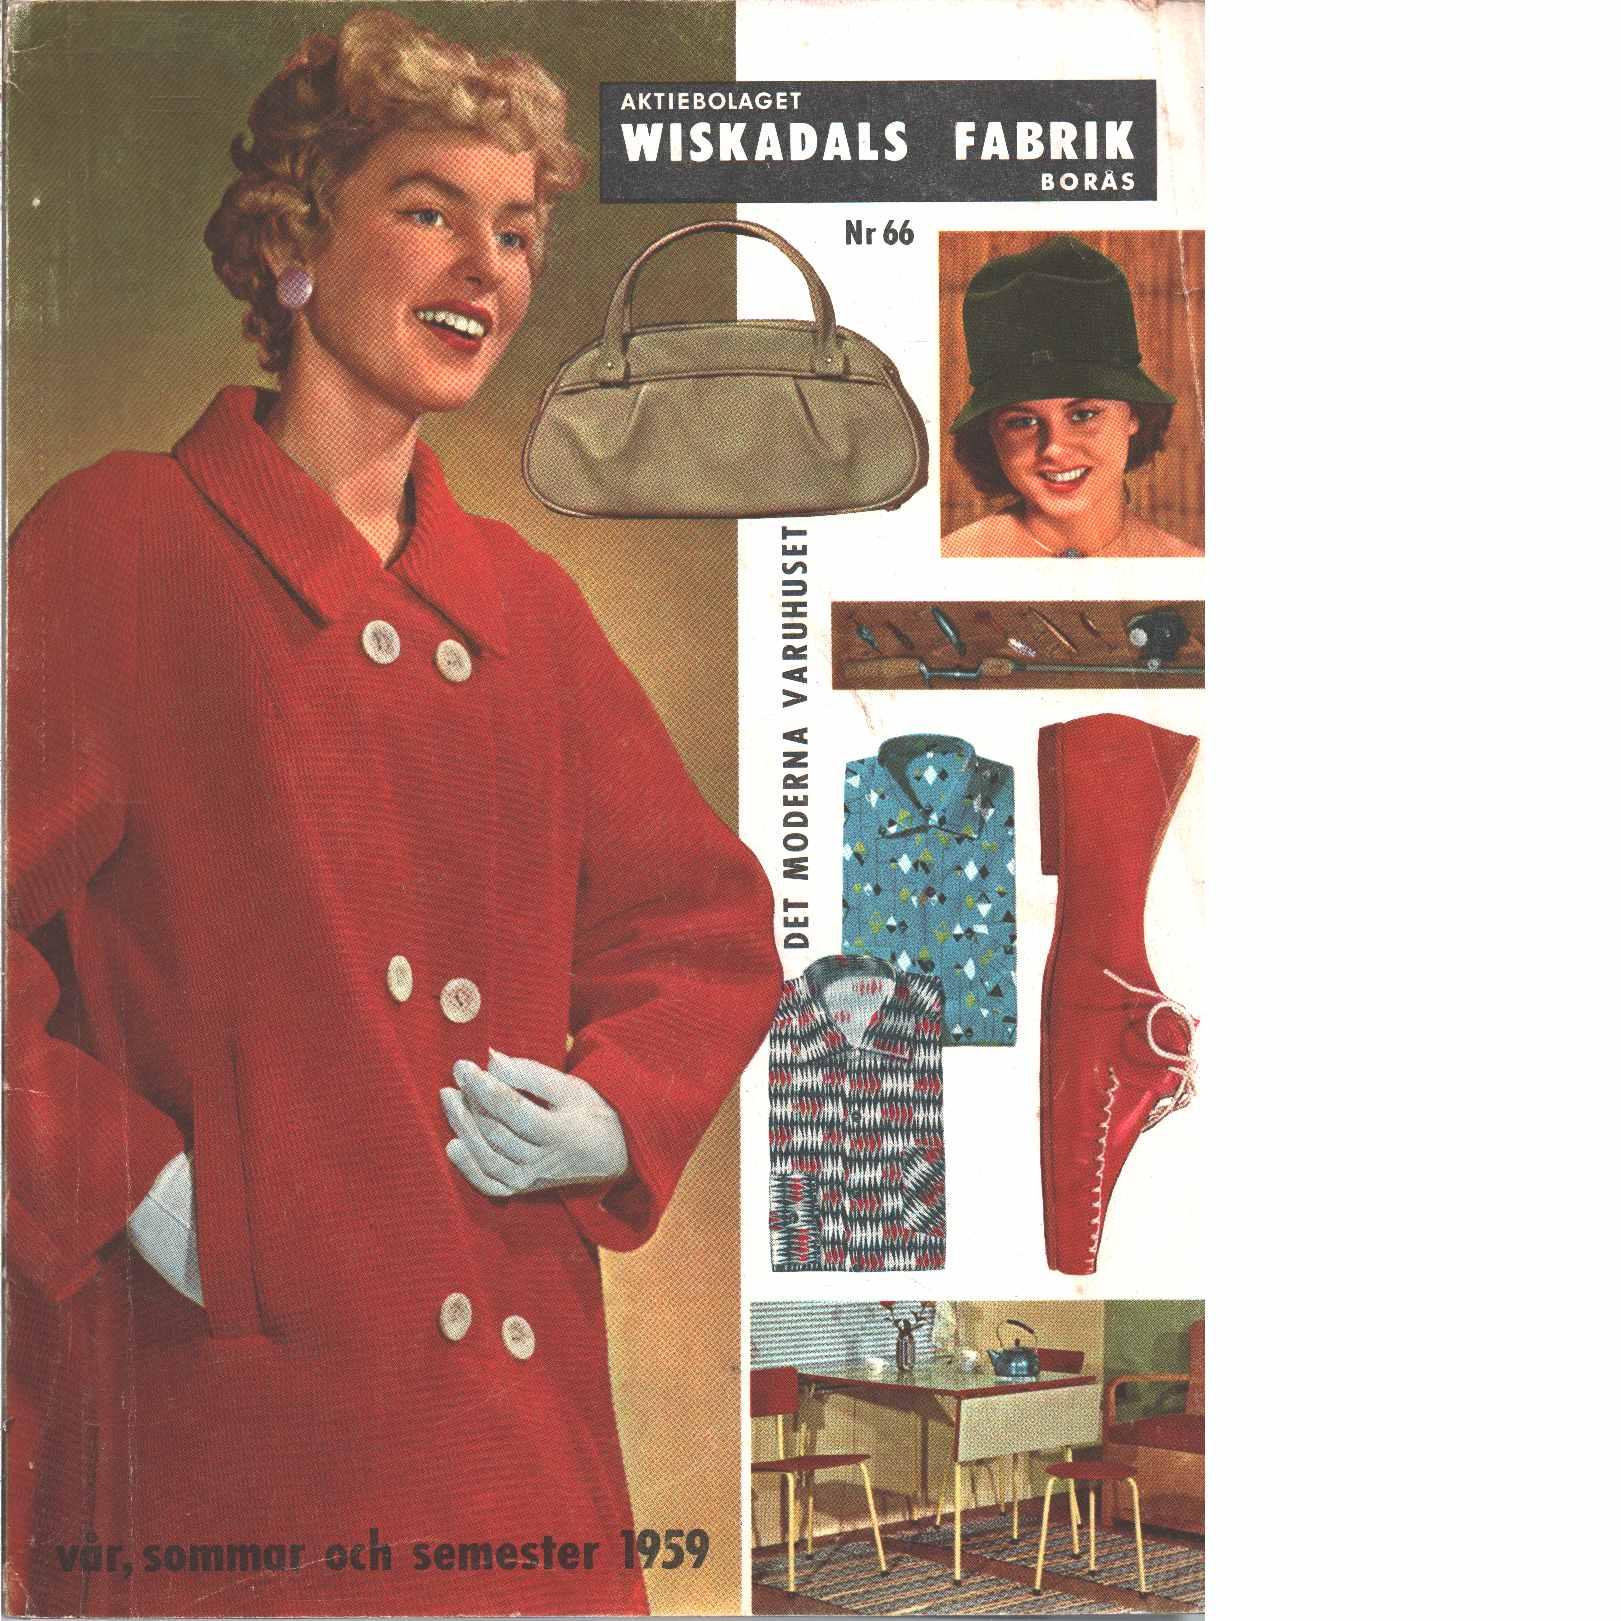 Wiskadals fabrik katalog - Red.